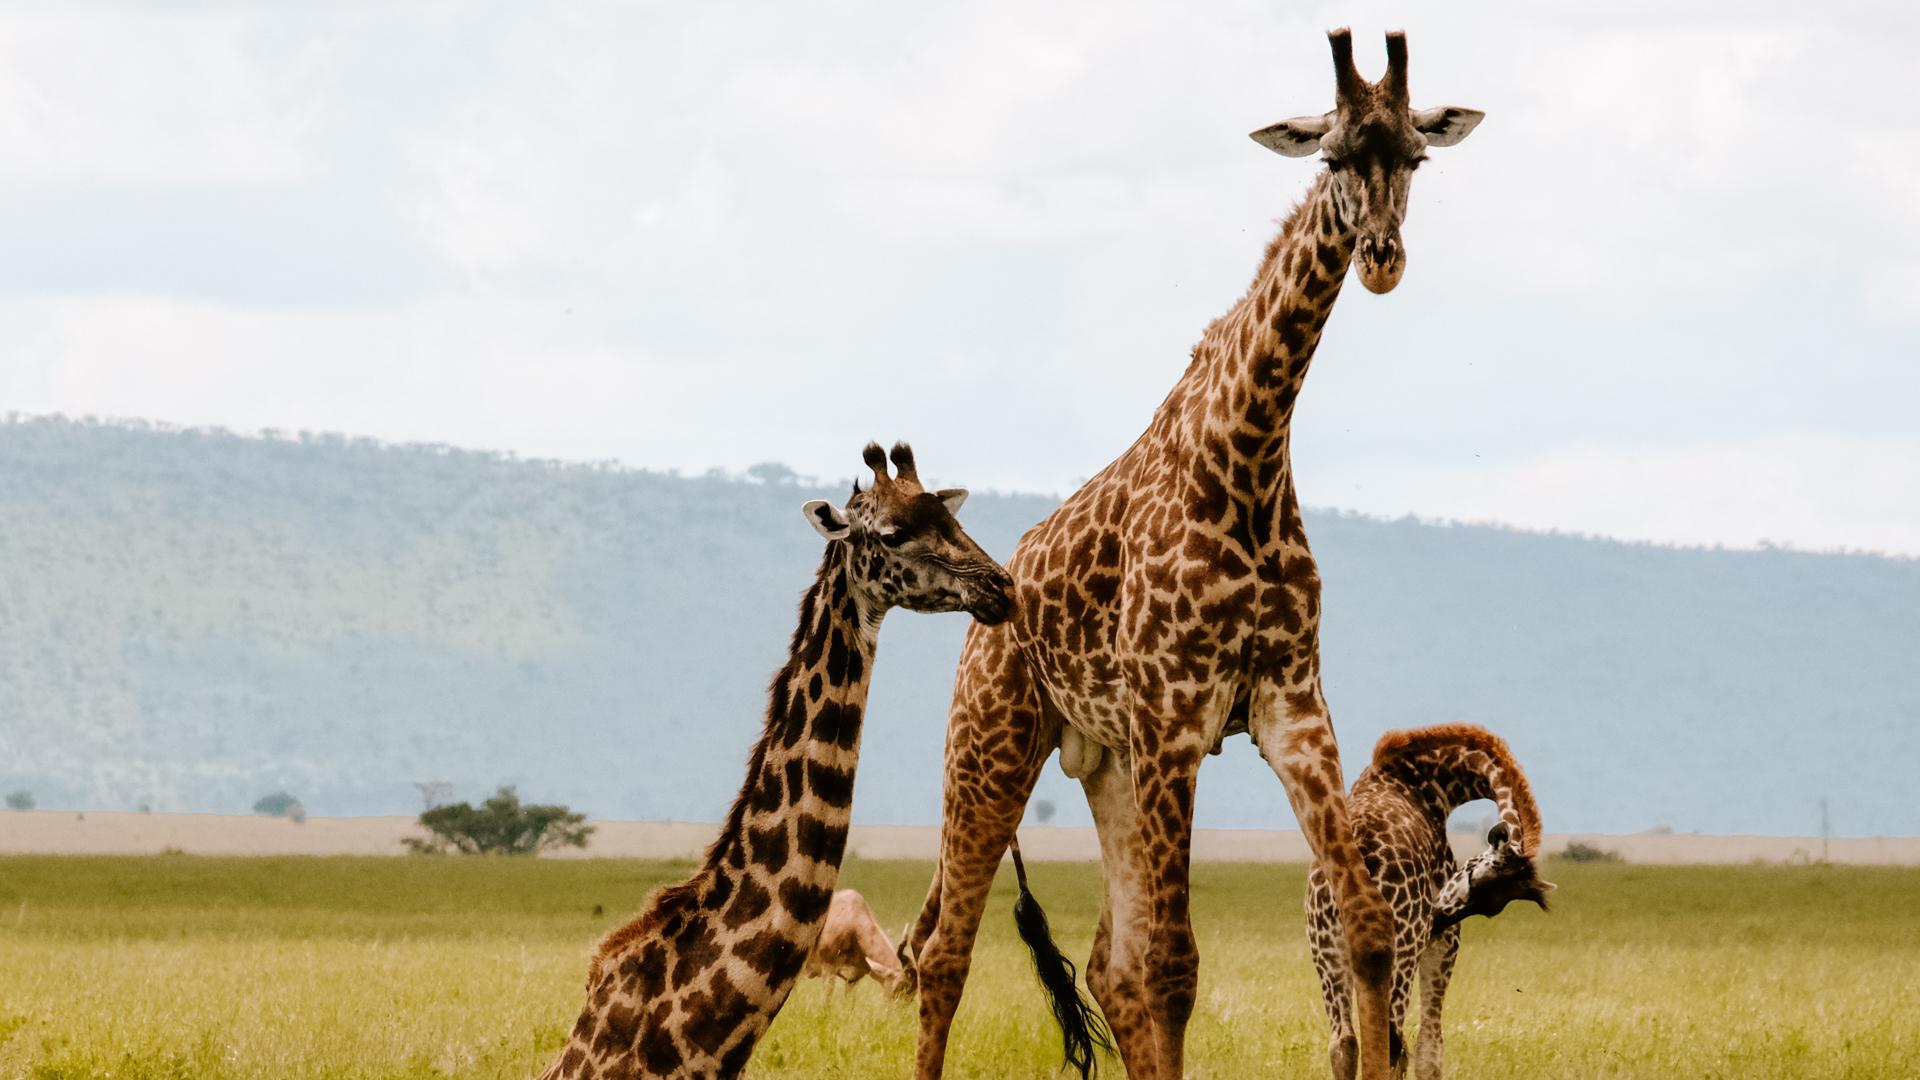 Masai giraffes on the savanna of the Serengeti National Park, Tanzania